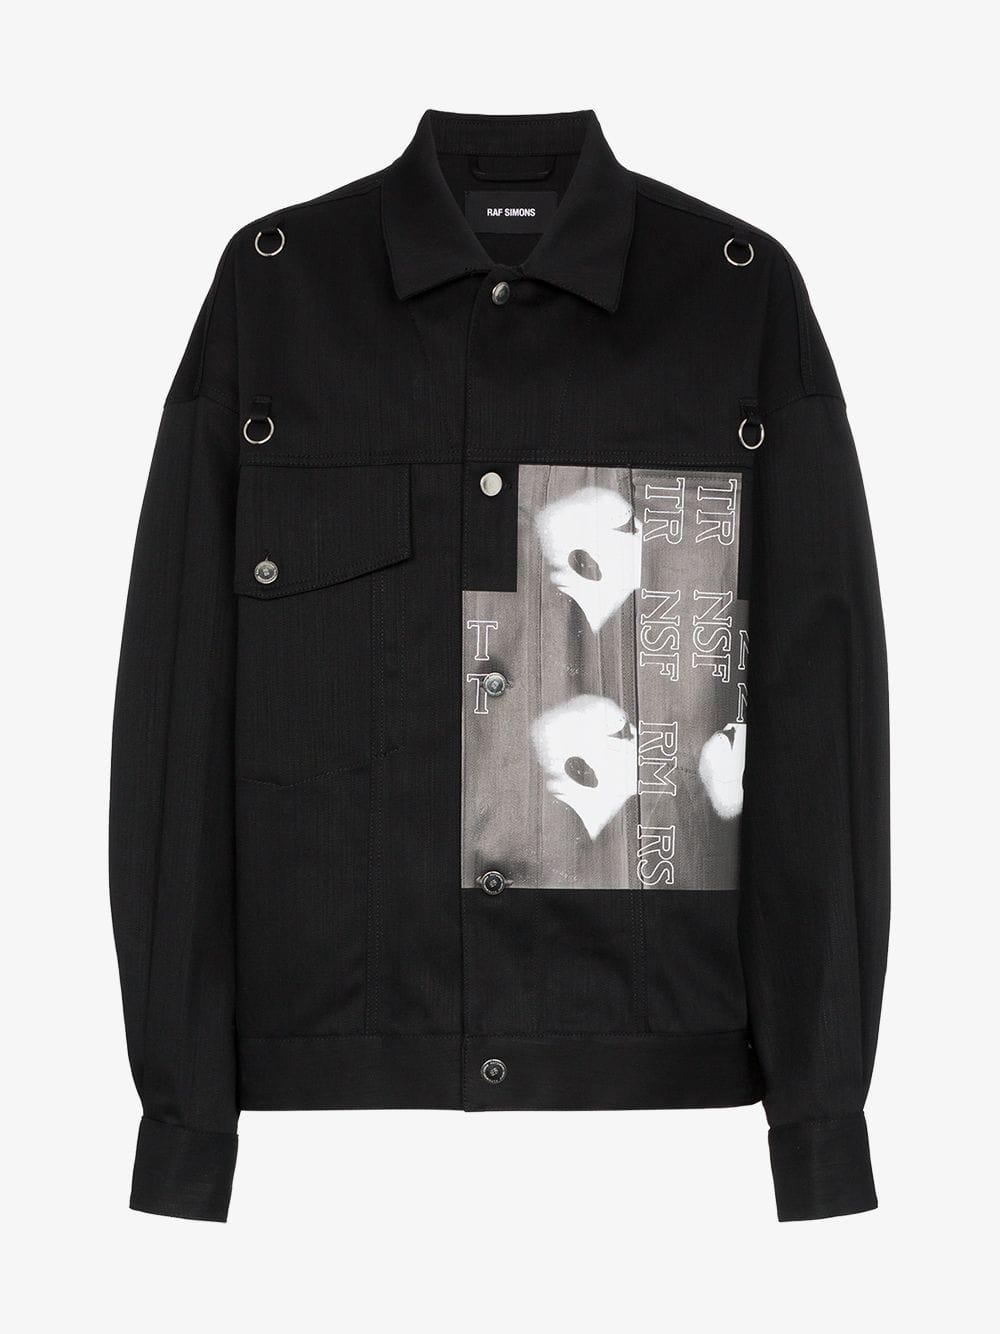 c755c95f83d Raf Simons - Black Graphic Print Badge Embellished Denim Jacket for Men -  Lyst. View fullscreen